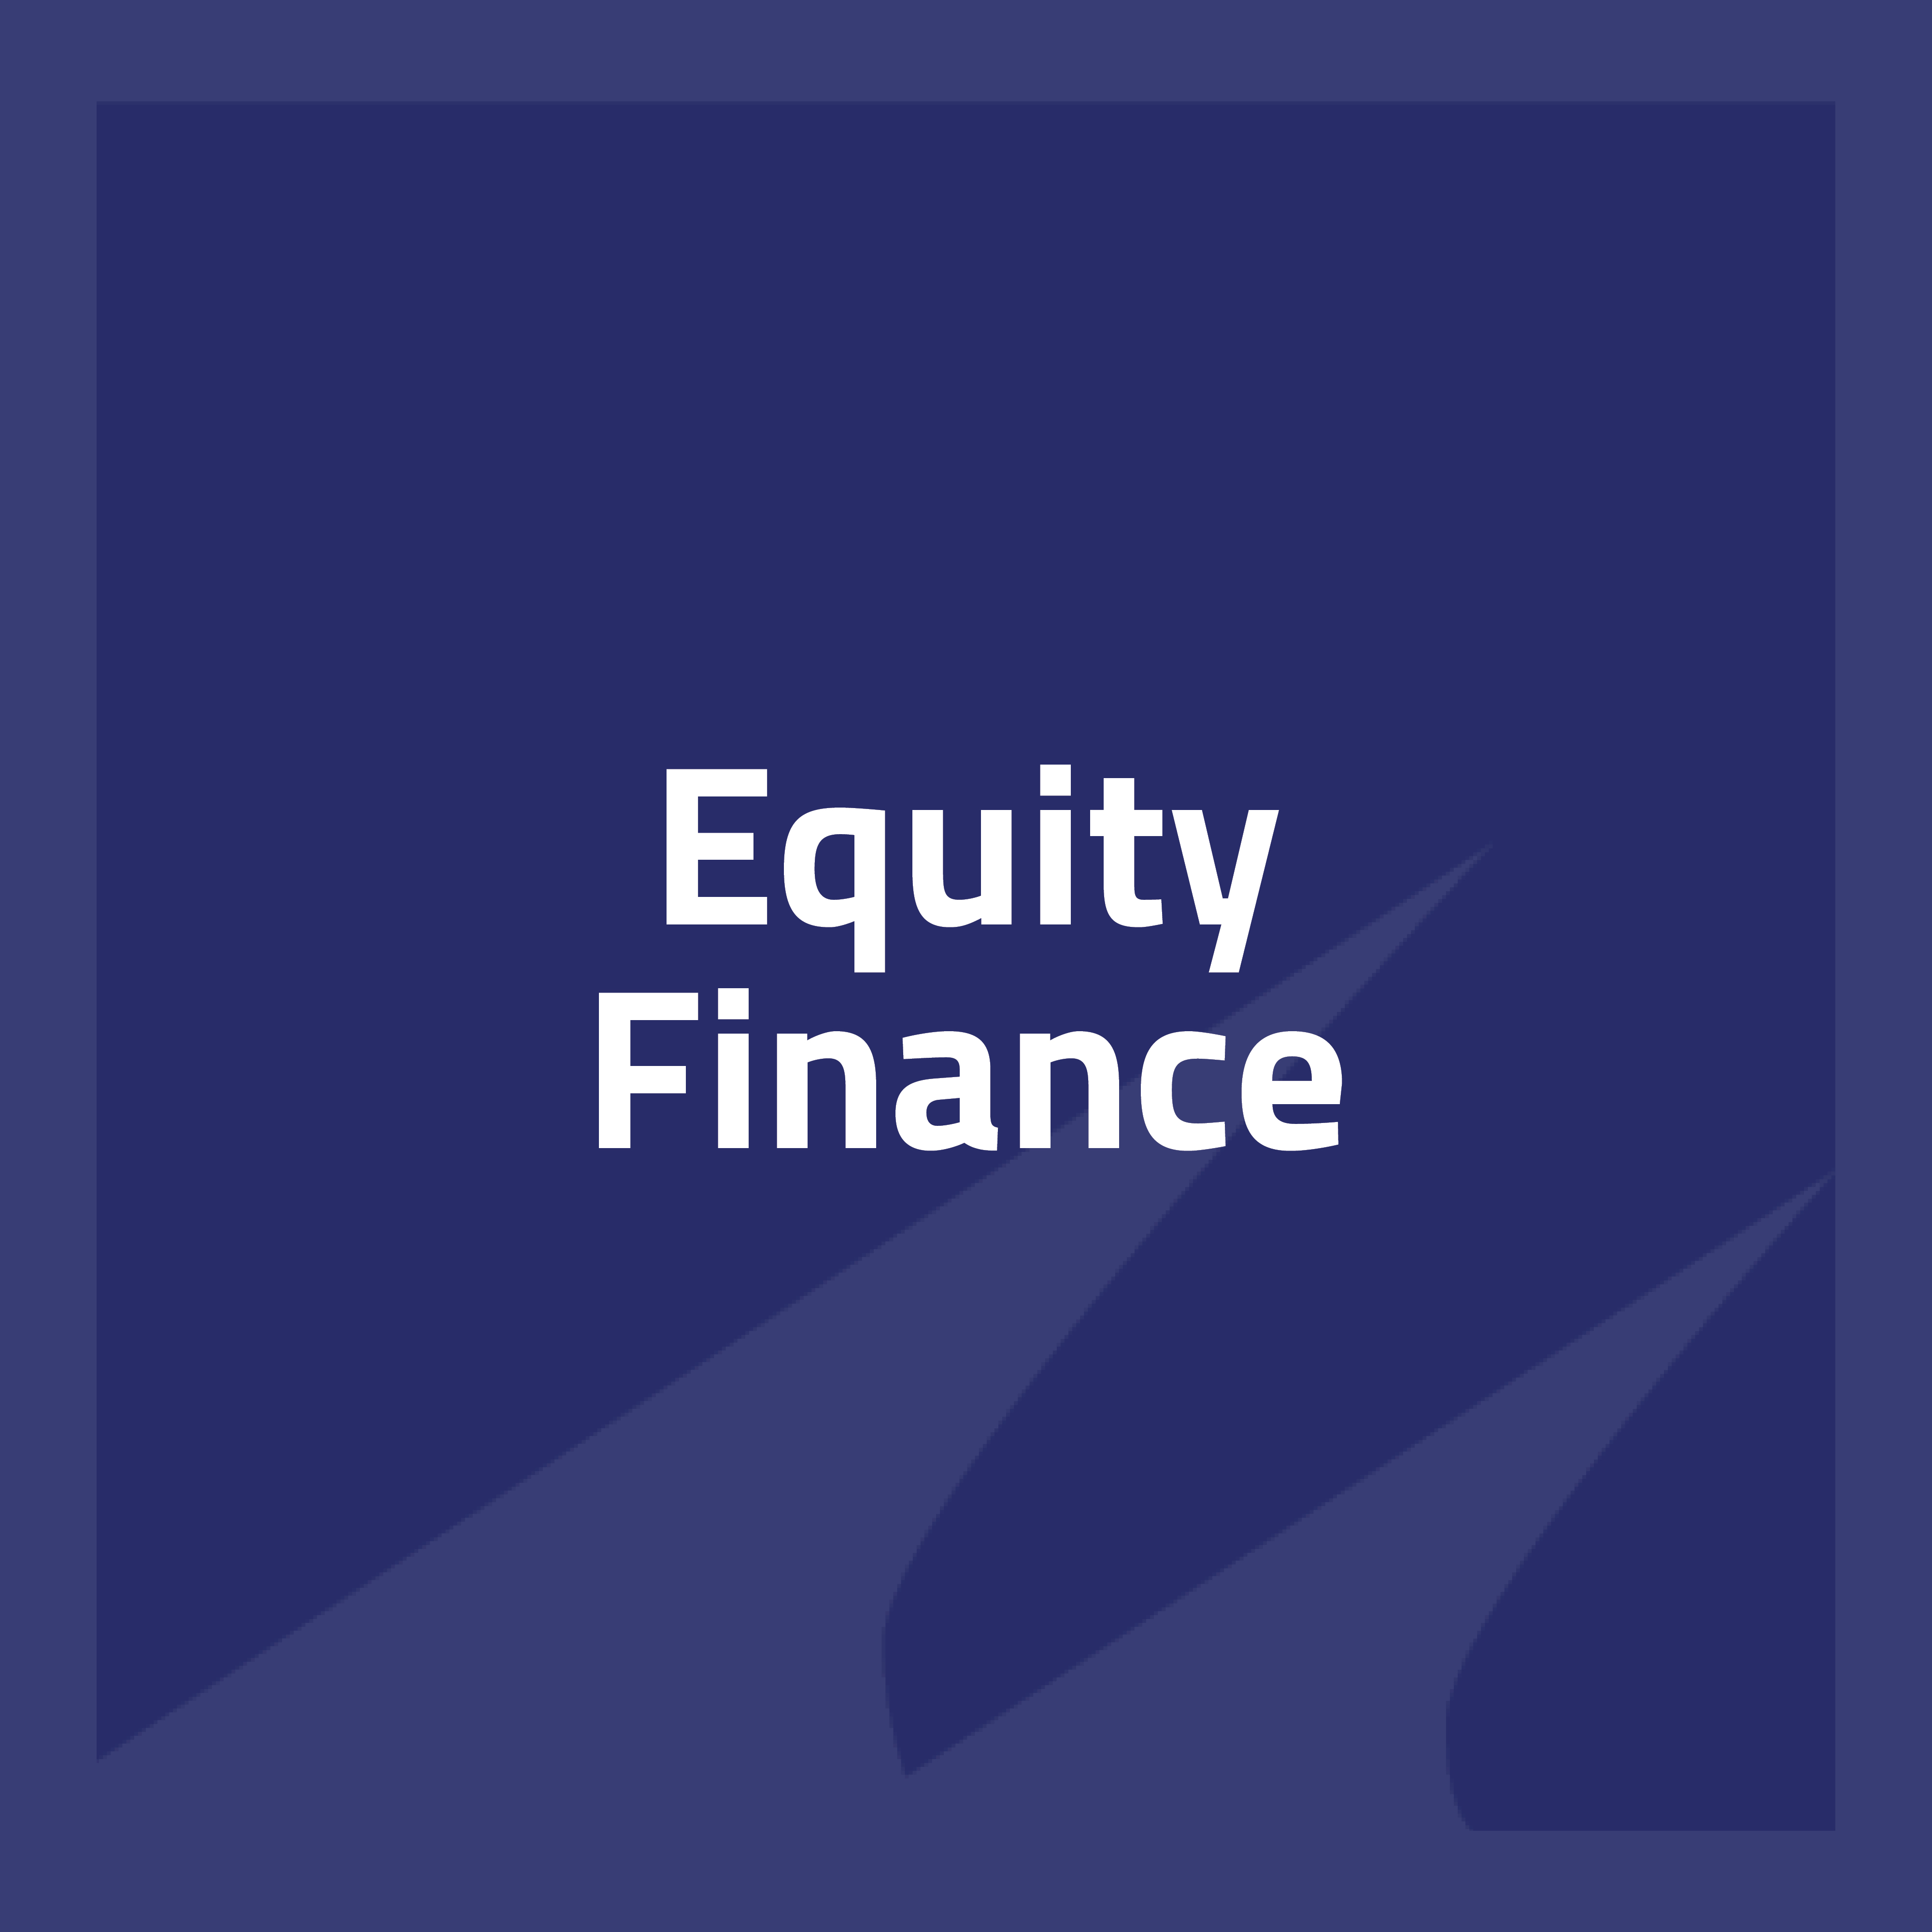 EquityFinance